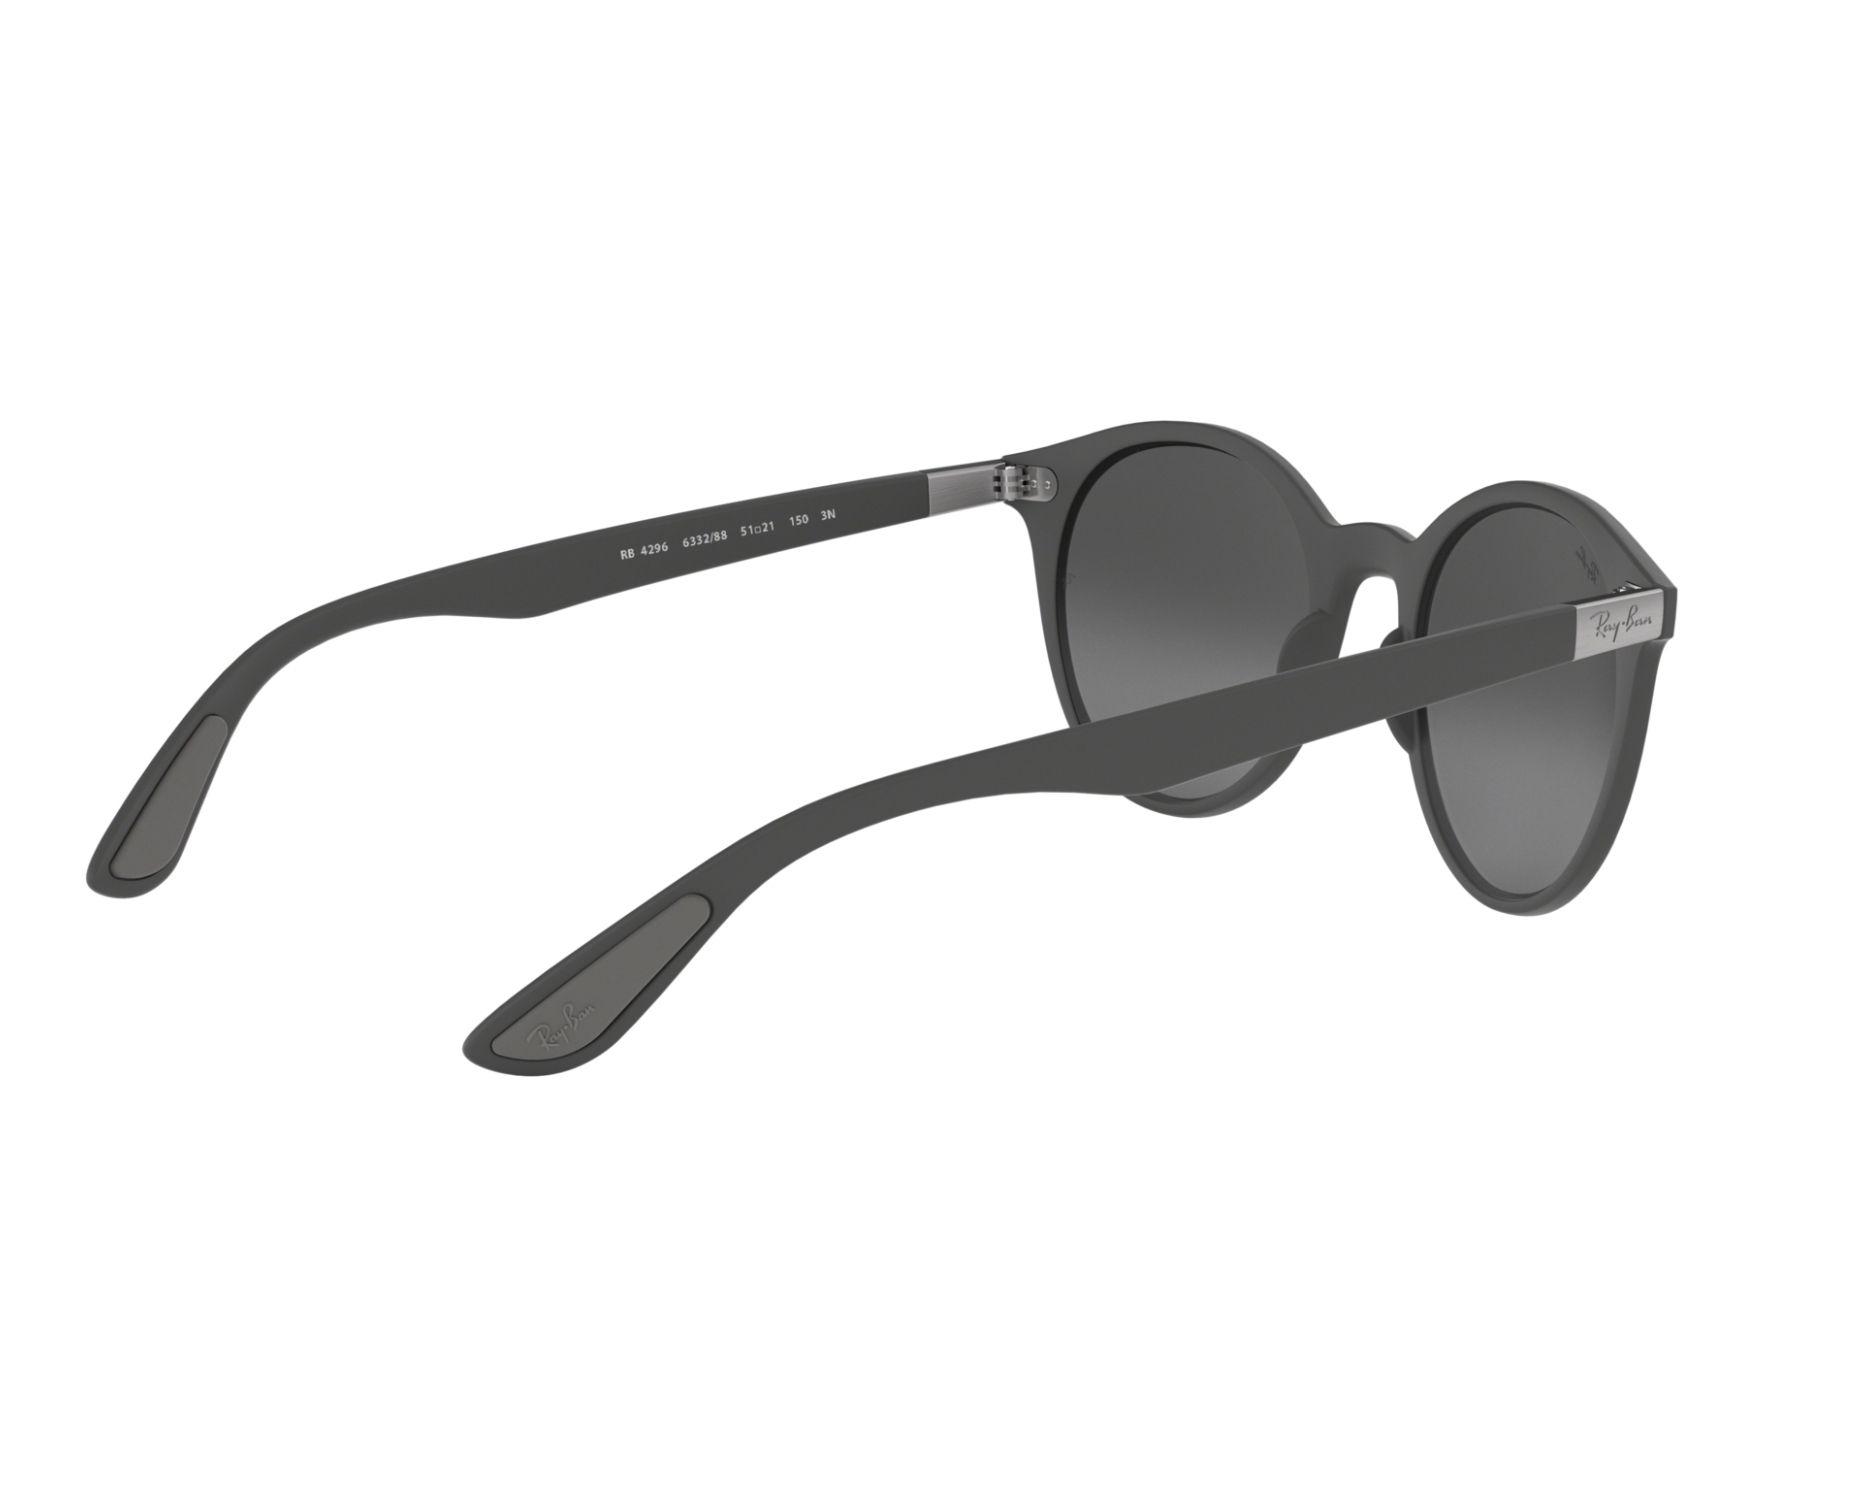 Sunglasses Ray-Ban RB-4296 633288 51-21 Grey 360 degree view 9 c2c574f6c3